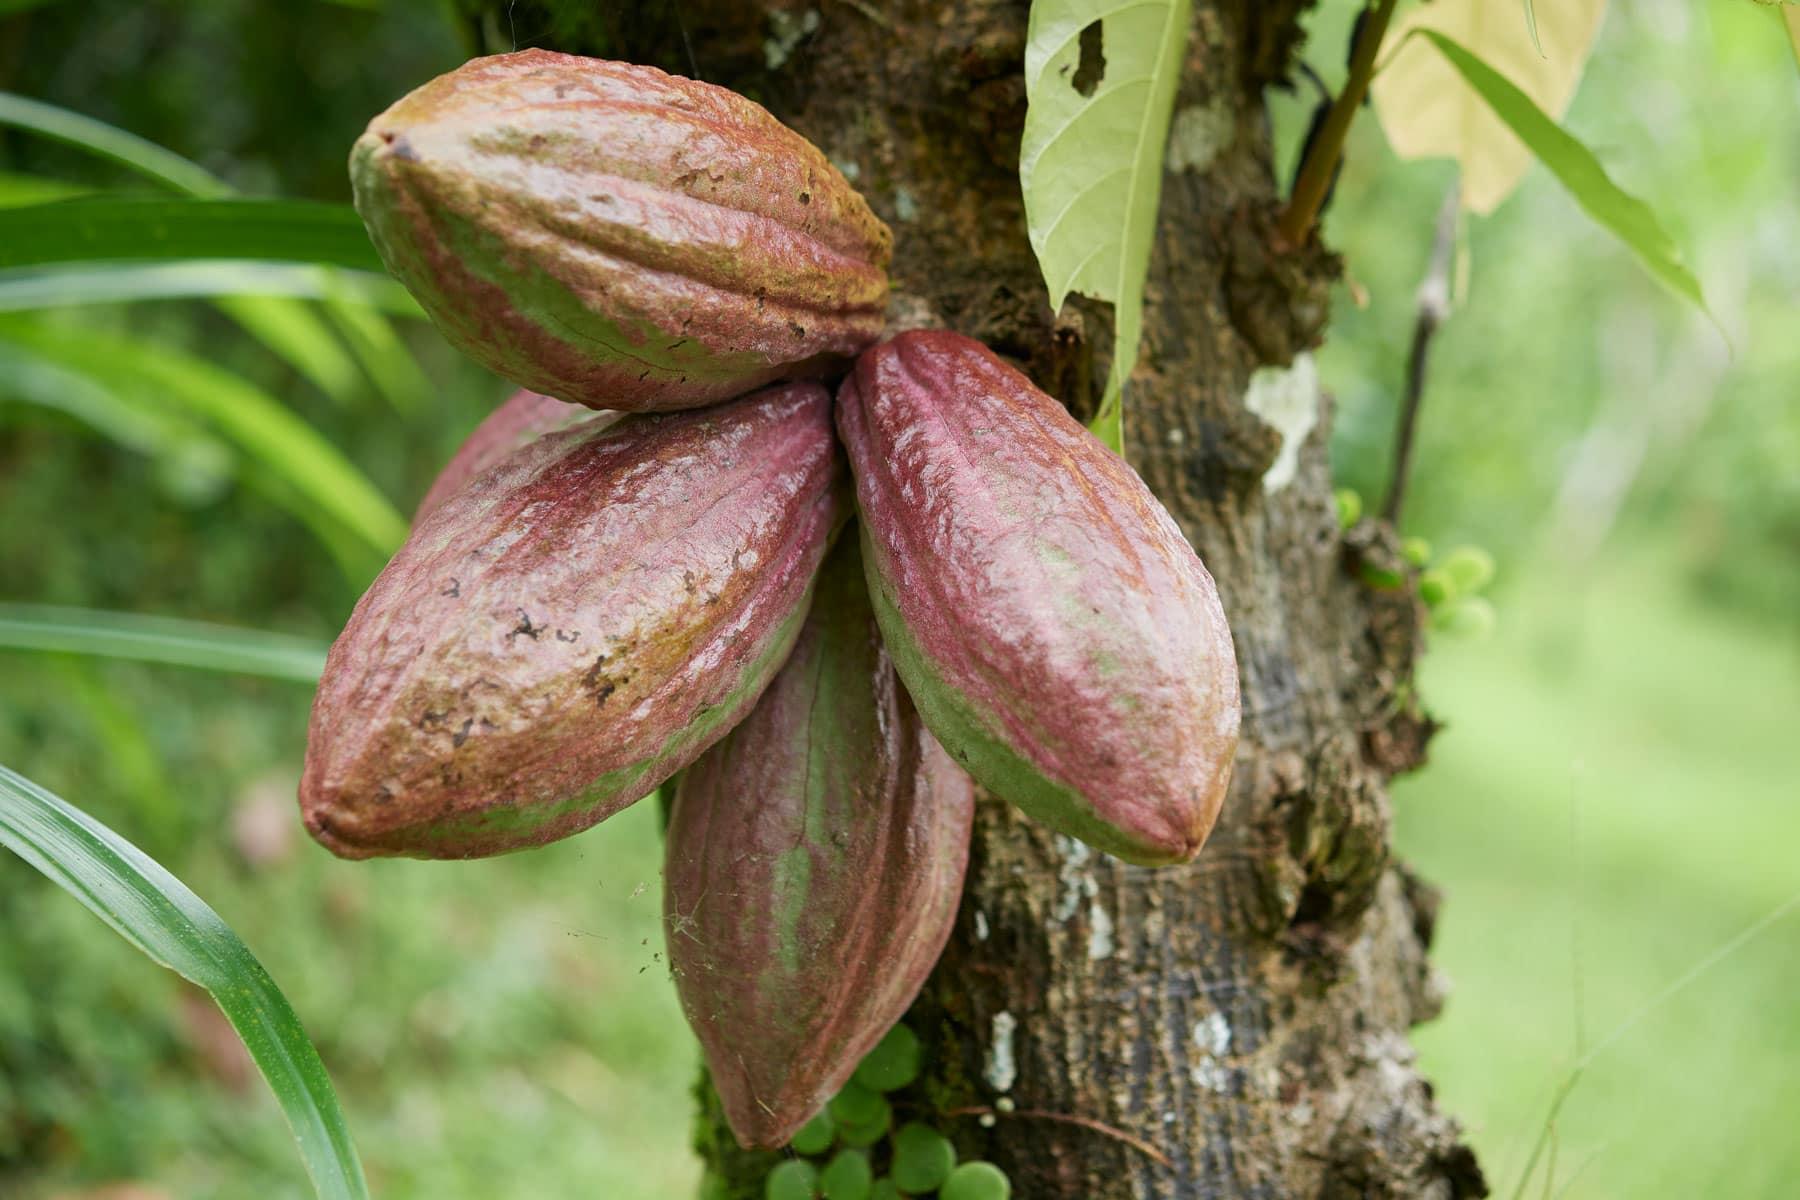 Foto mehrerer grünroten Kakaofrüchten am Baum